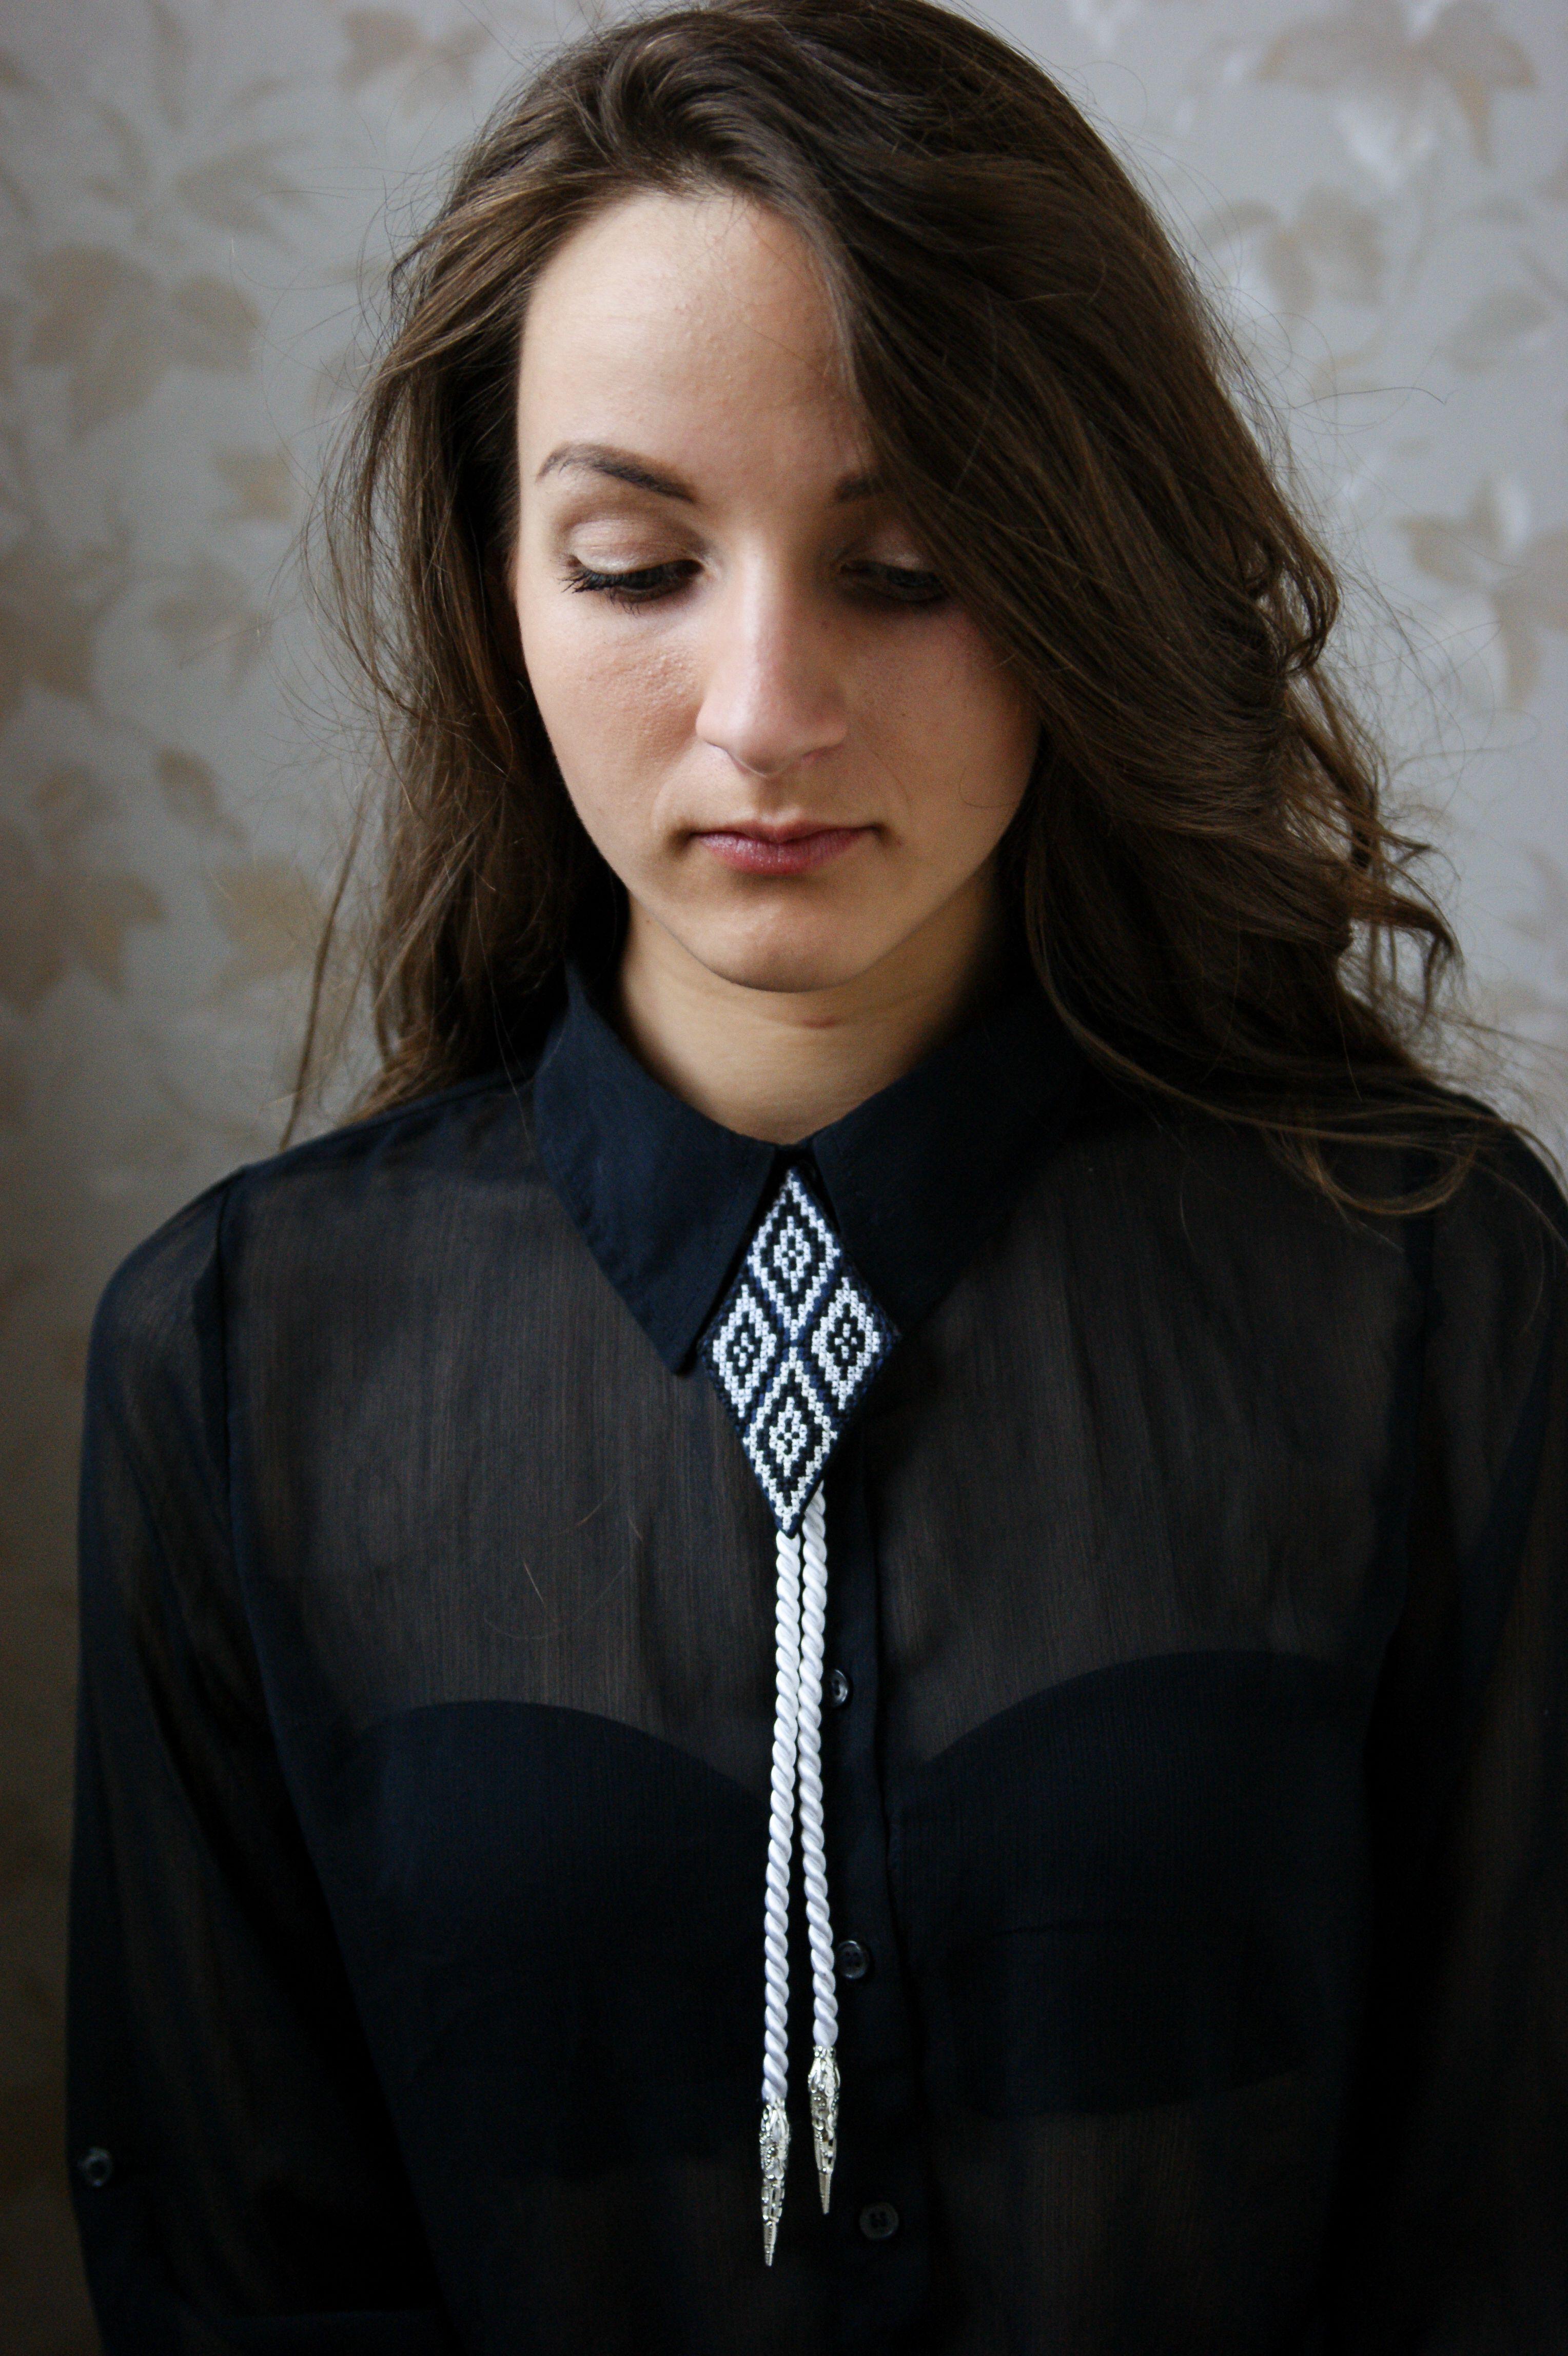 cff69b330a21 Simple Necklace Designs, Friendship Necklaces, Vintage Men, Clothes For  Women, Nice Clothes